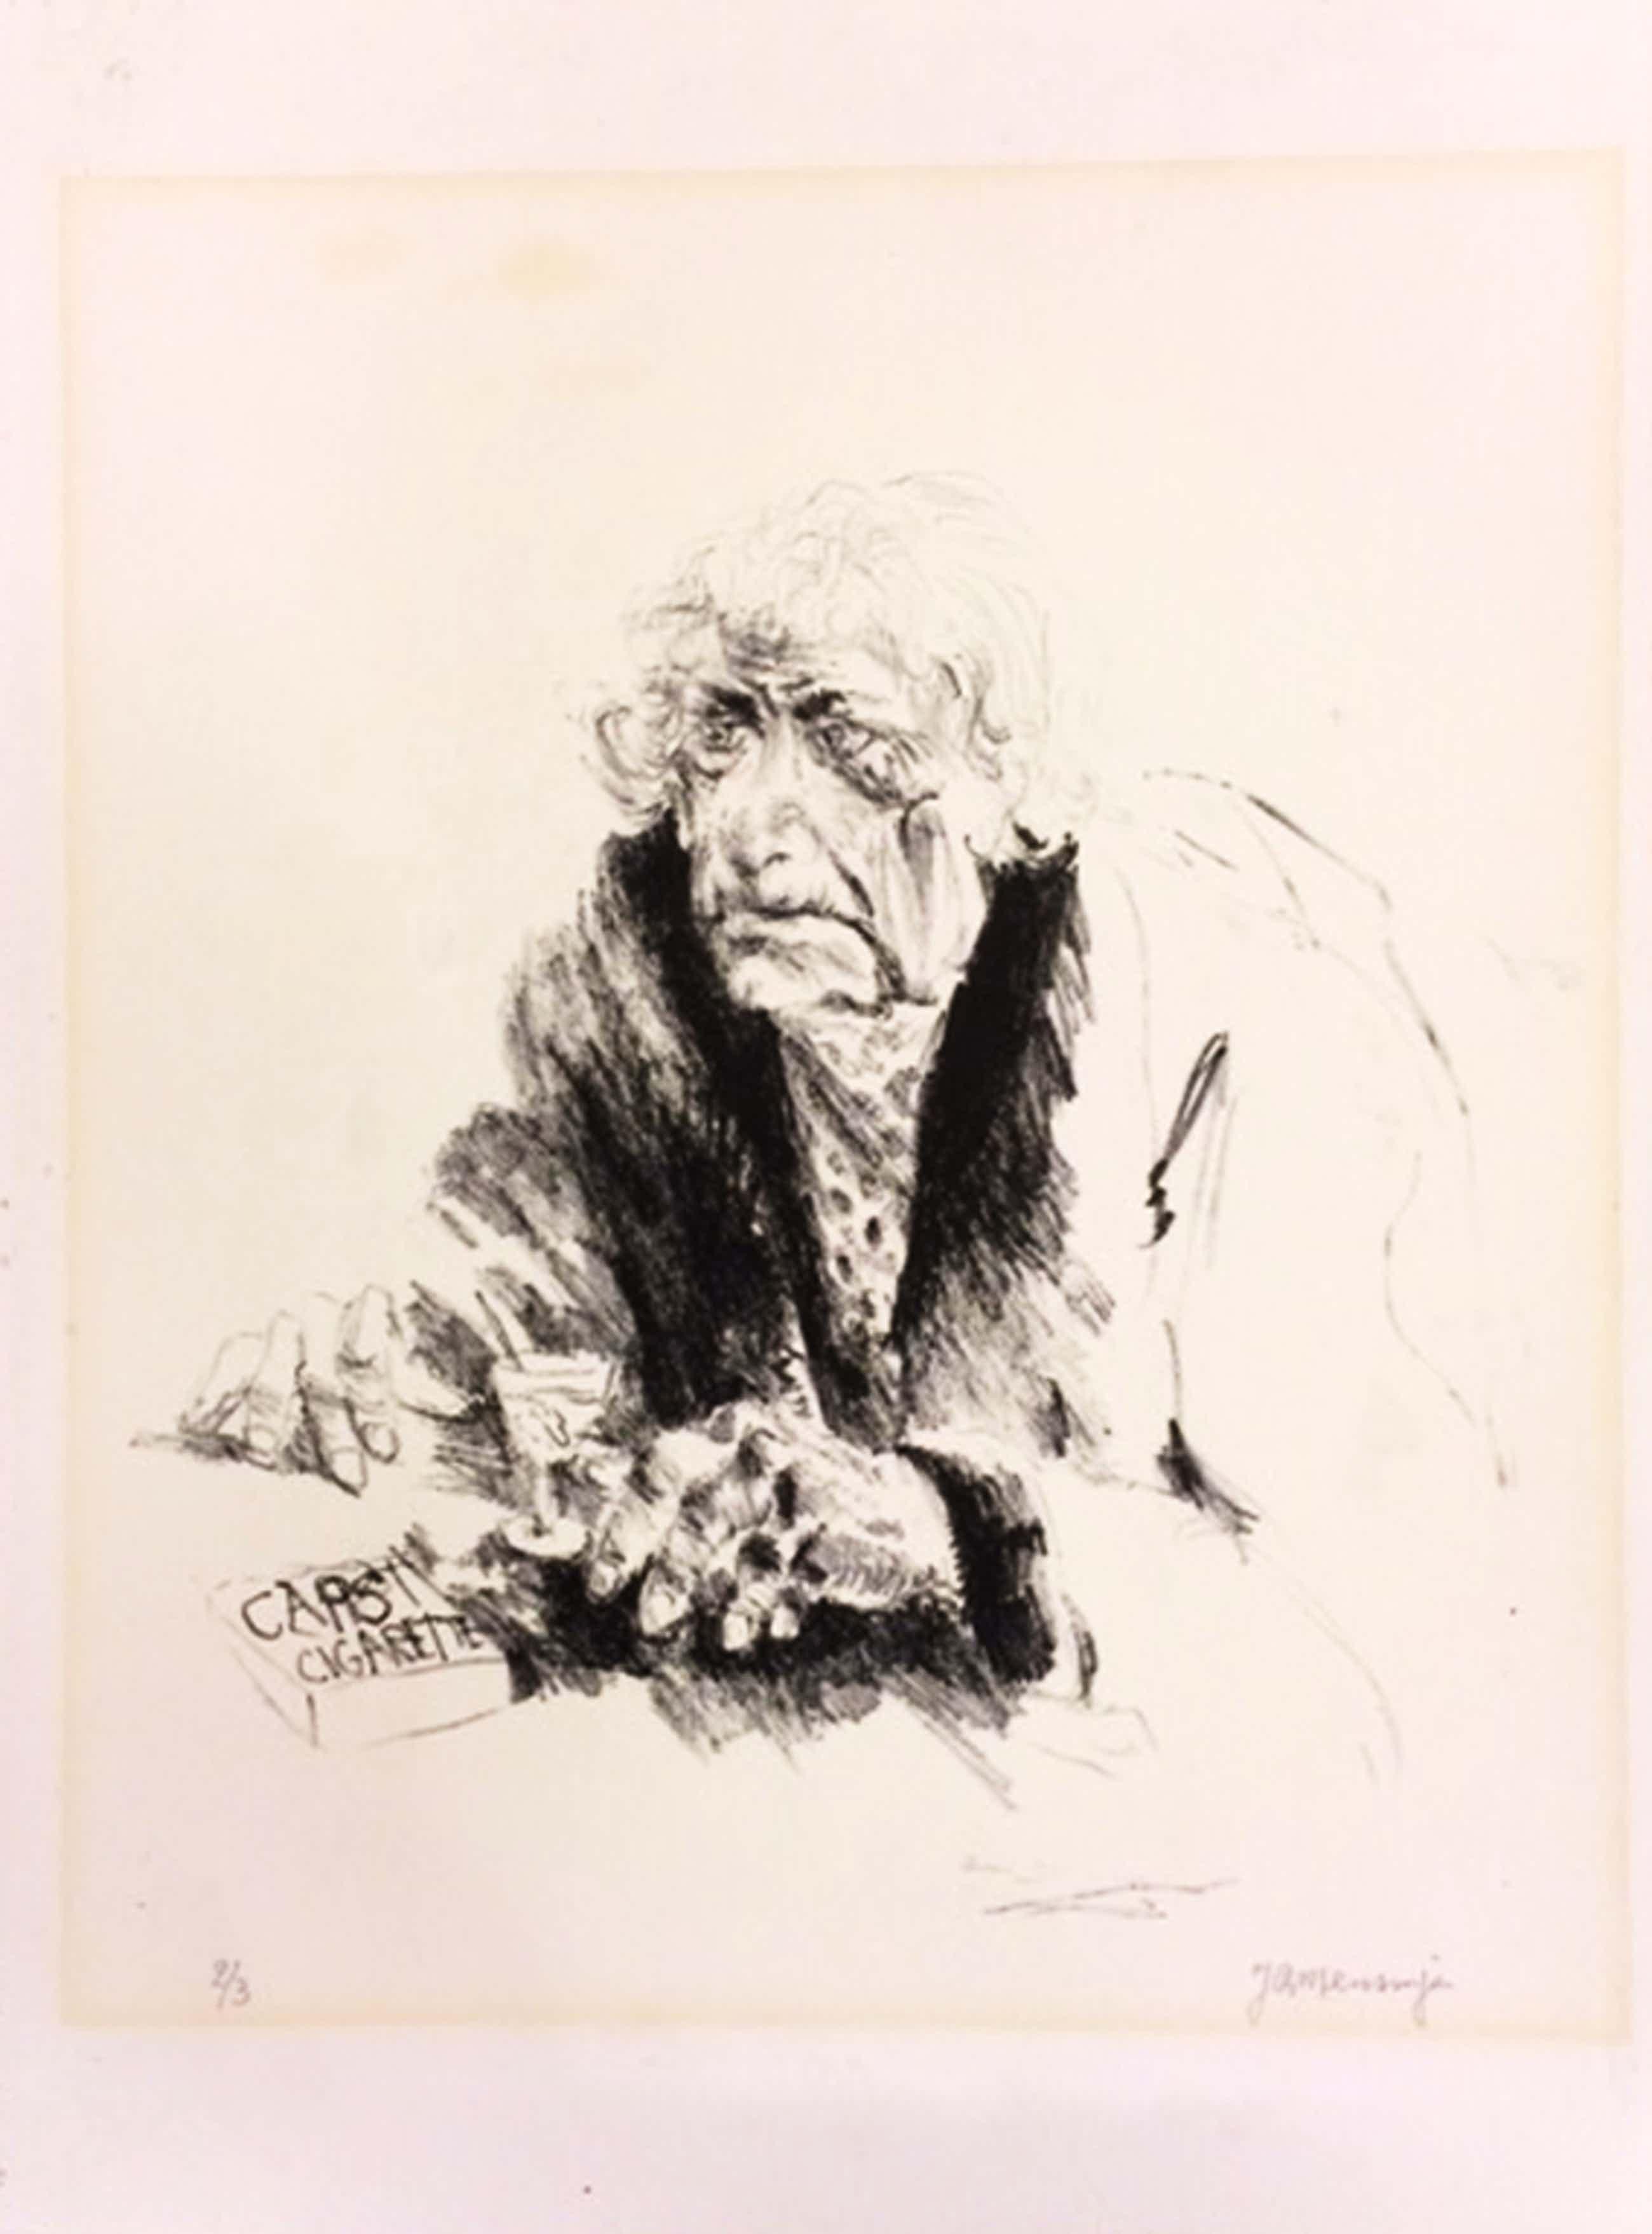 Jan Mensinga, titel Mimi II, litho oplage 2/3, formaat 39 x 28,5 cm (papiermaat)   kopen? Bied vanaf 45!